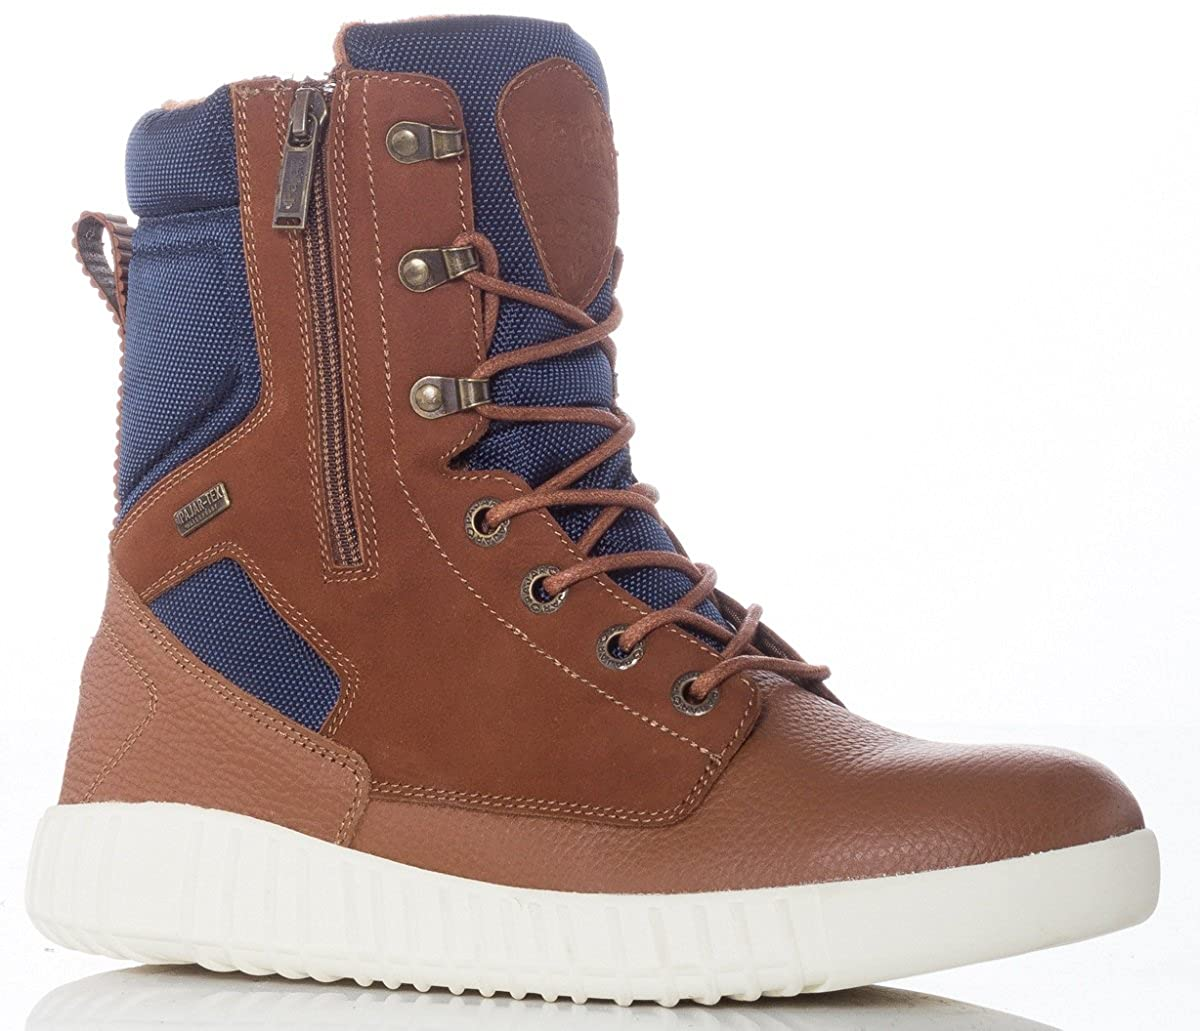 8e7bb1b6c82 Pajar Men's Pearson Boot